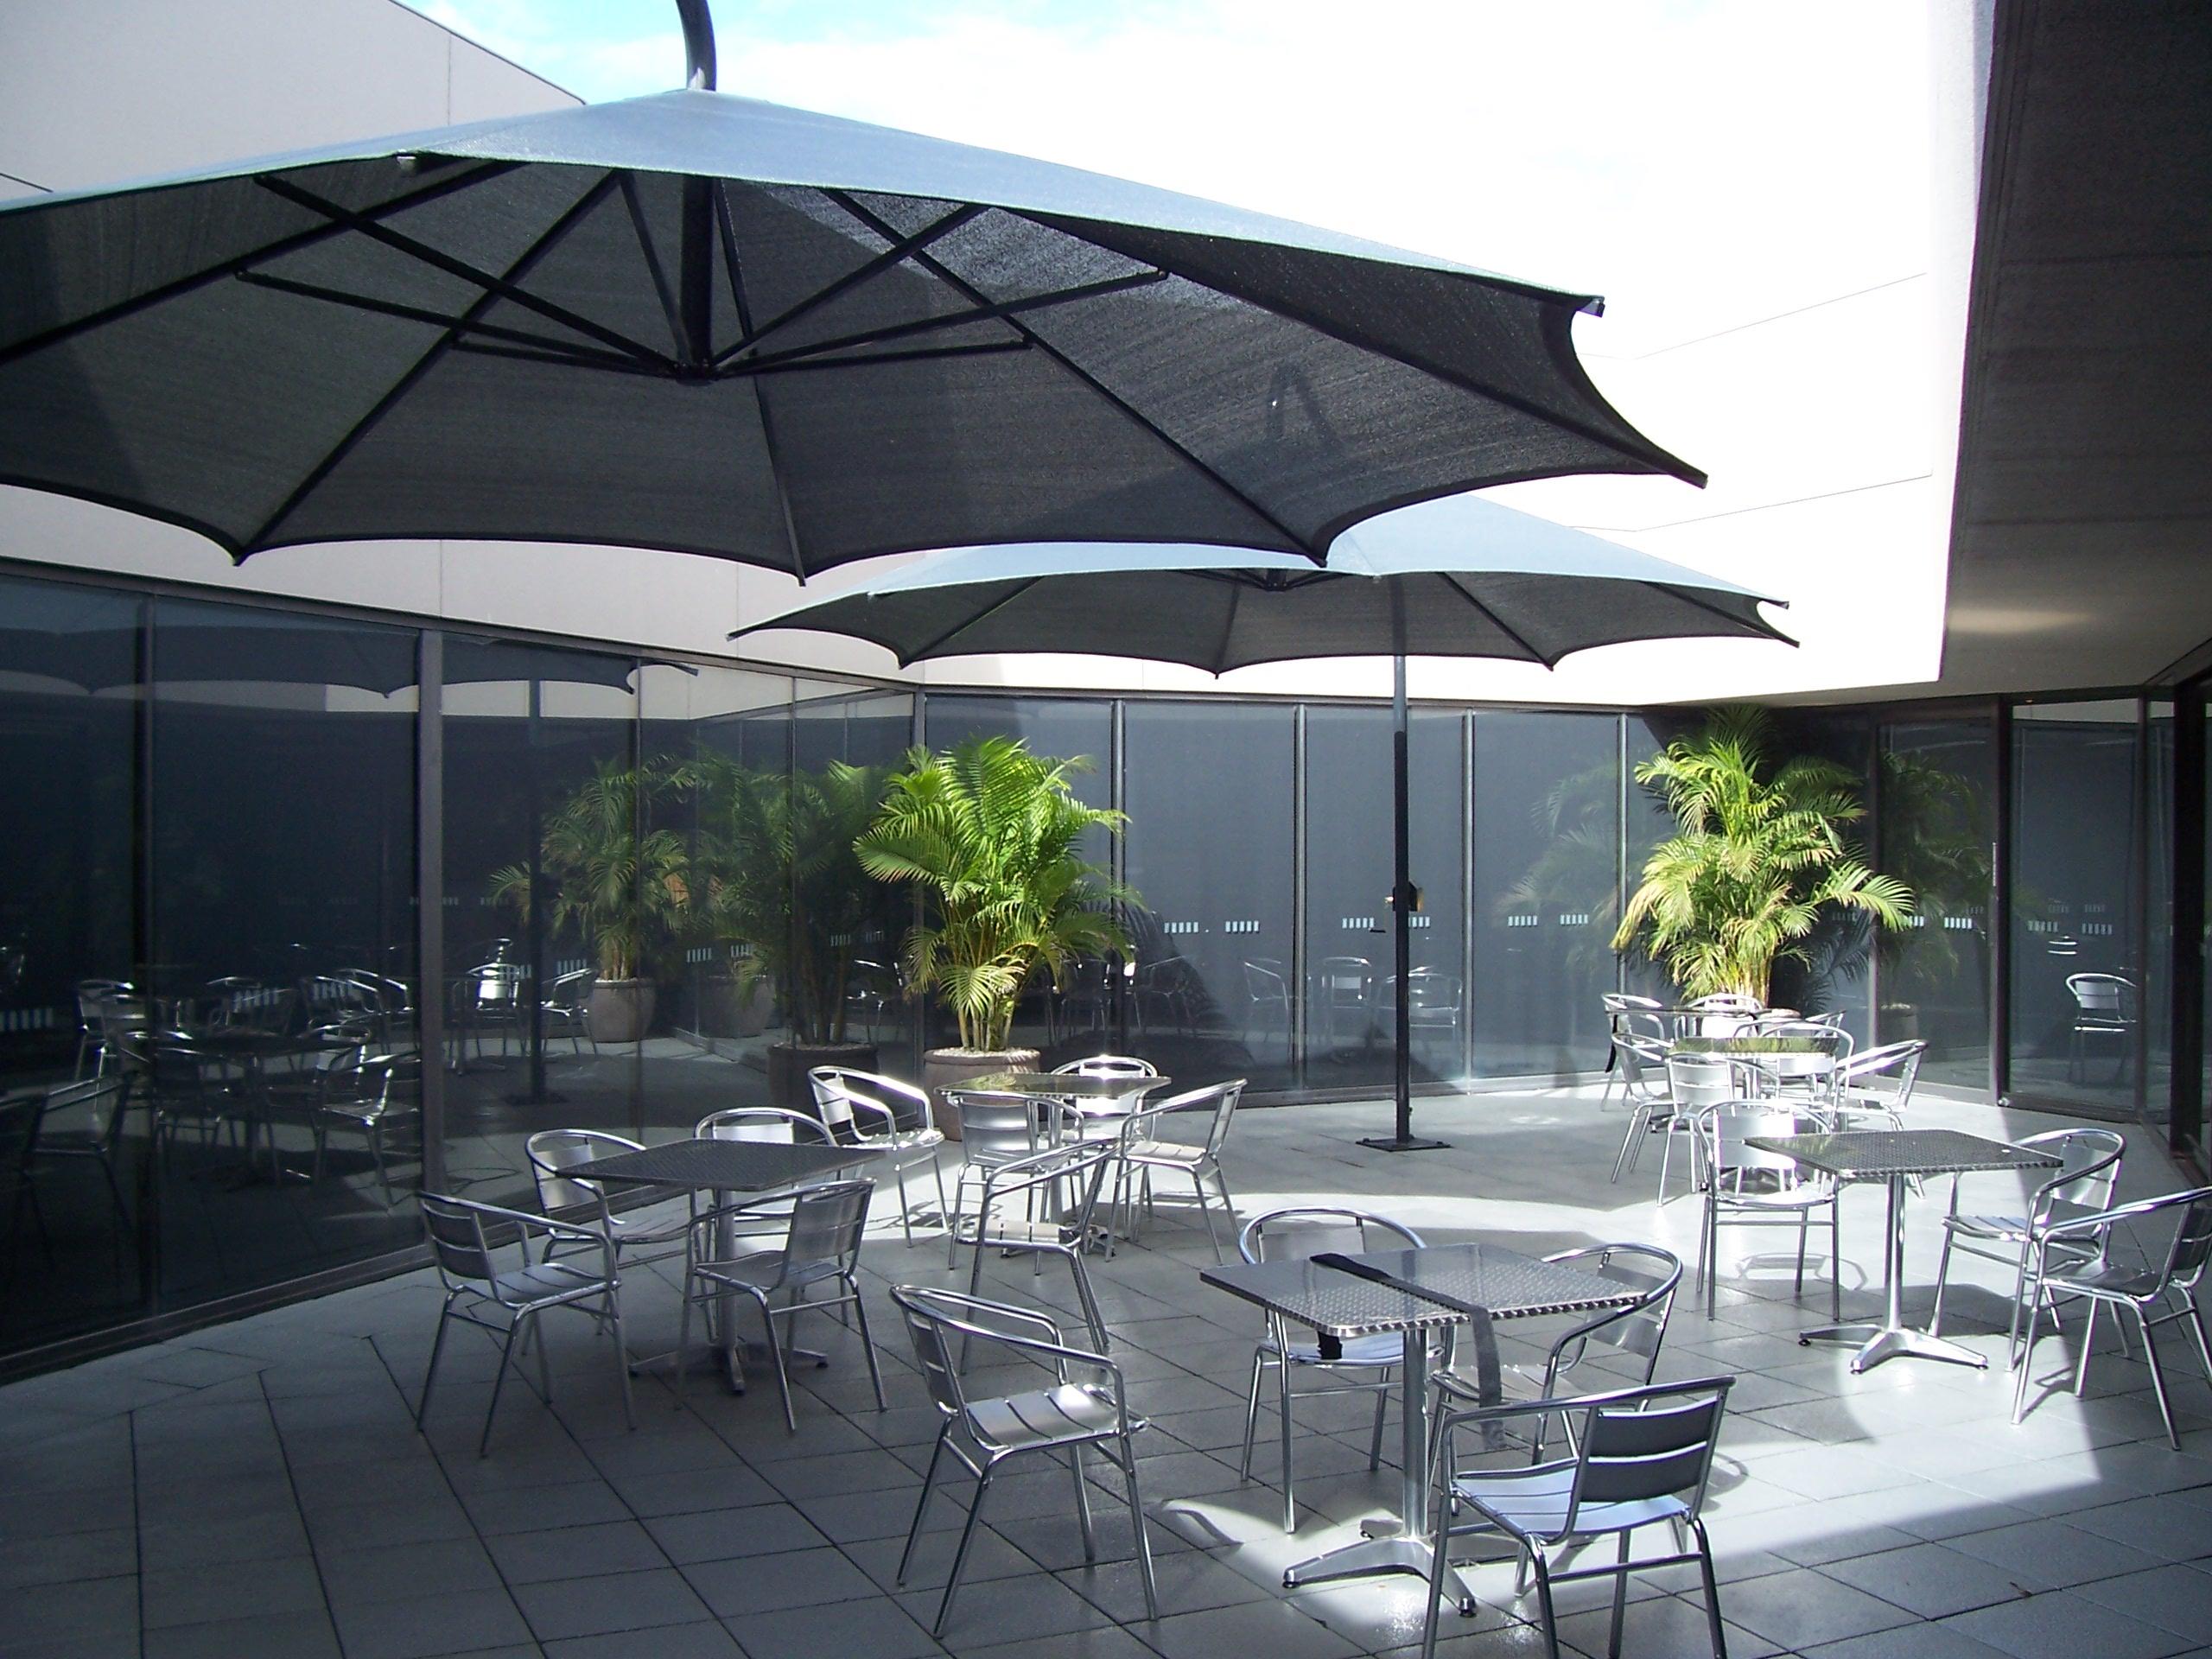 Umbrella Over Sandpit Photo S 004 100 0754 0745